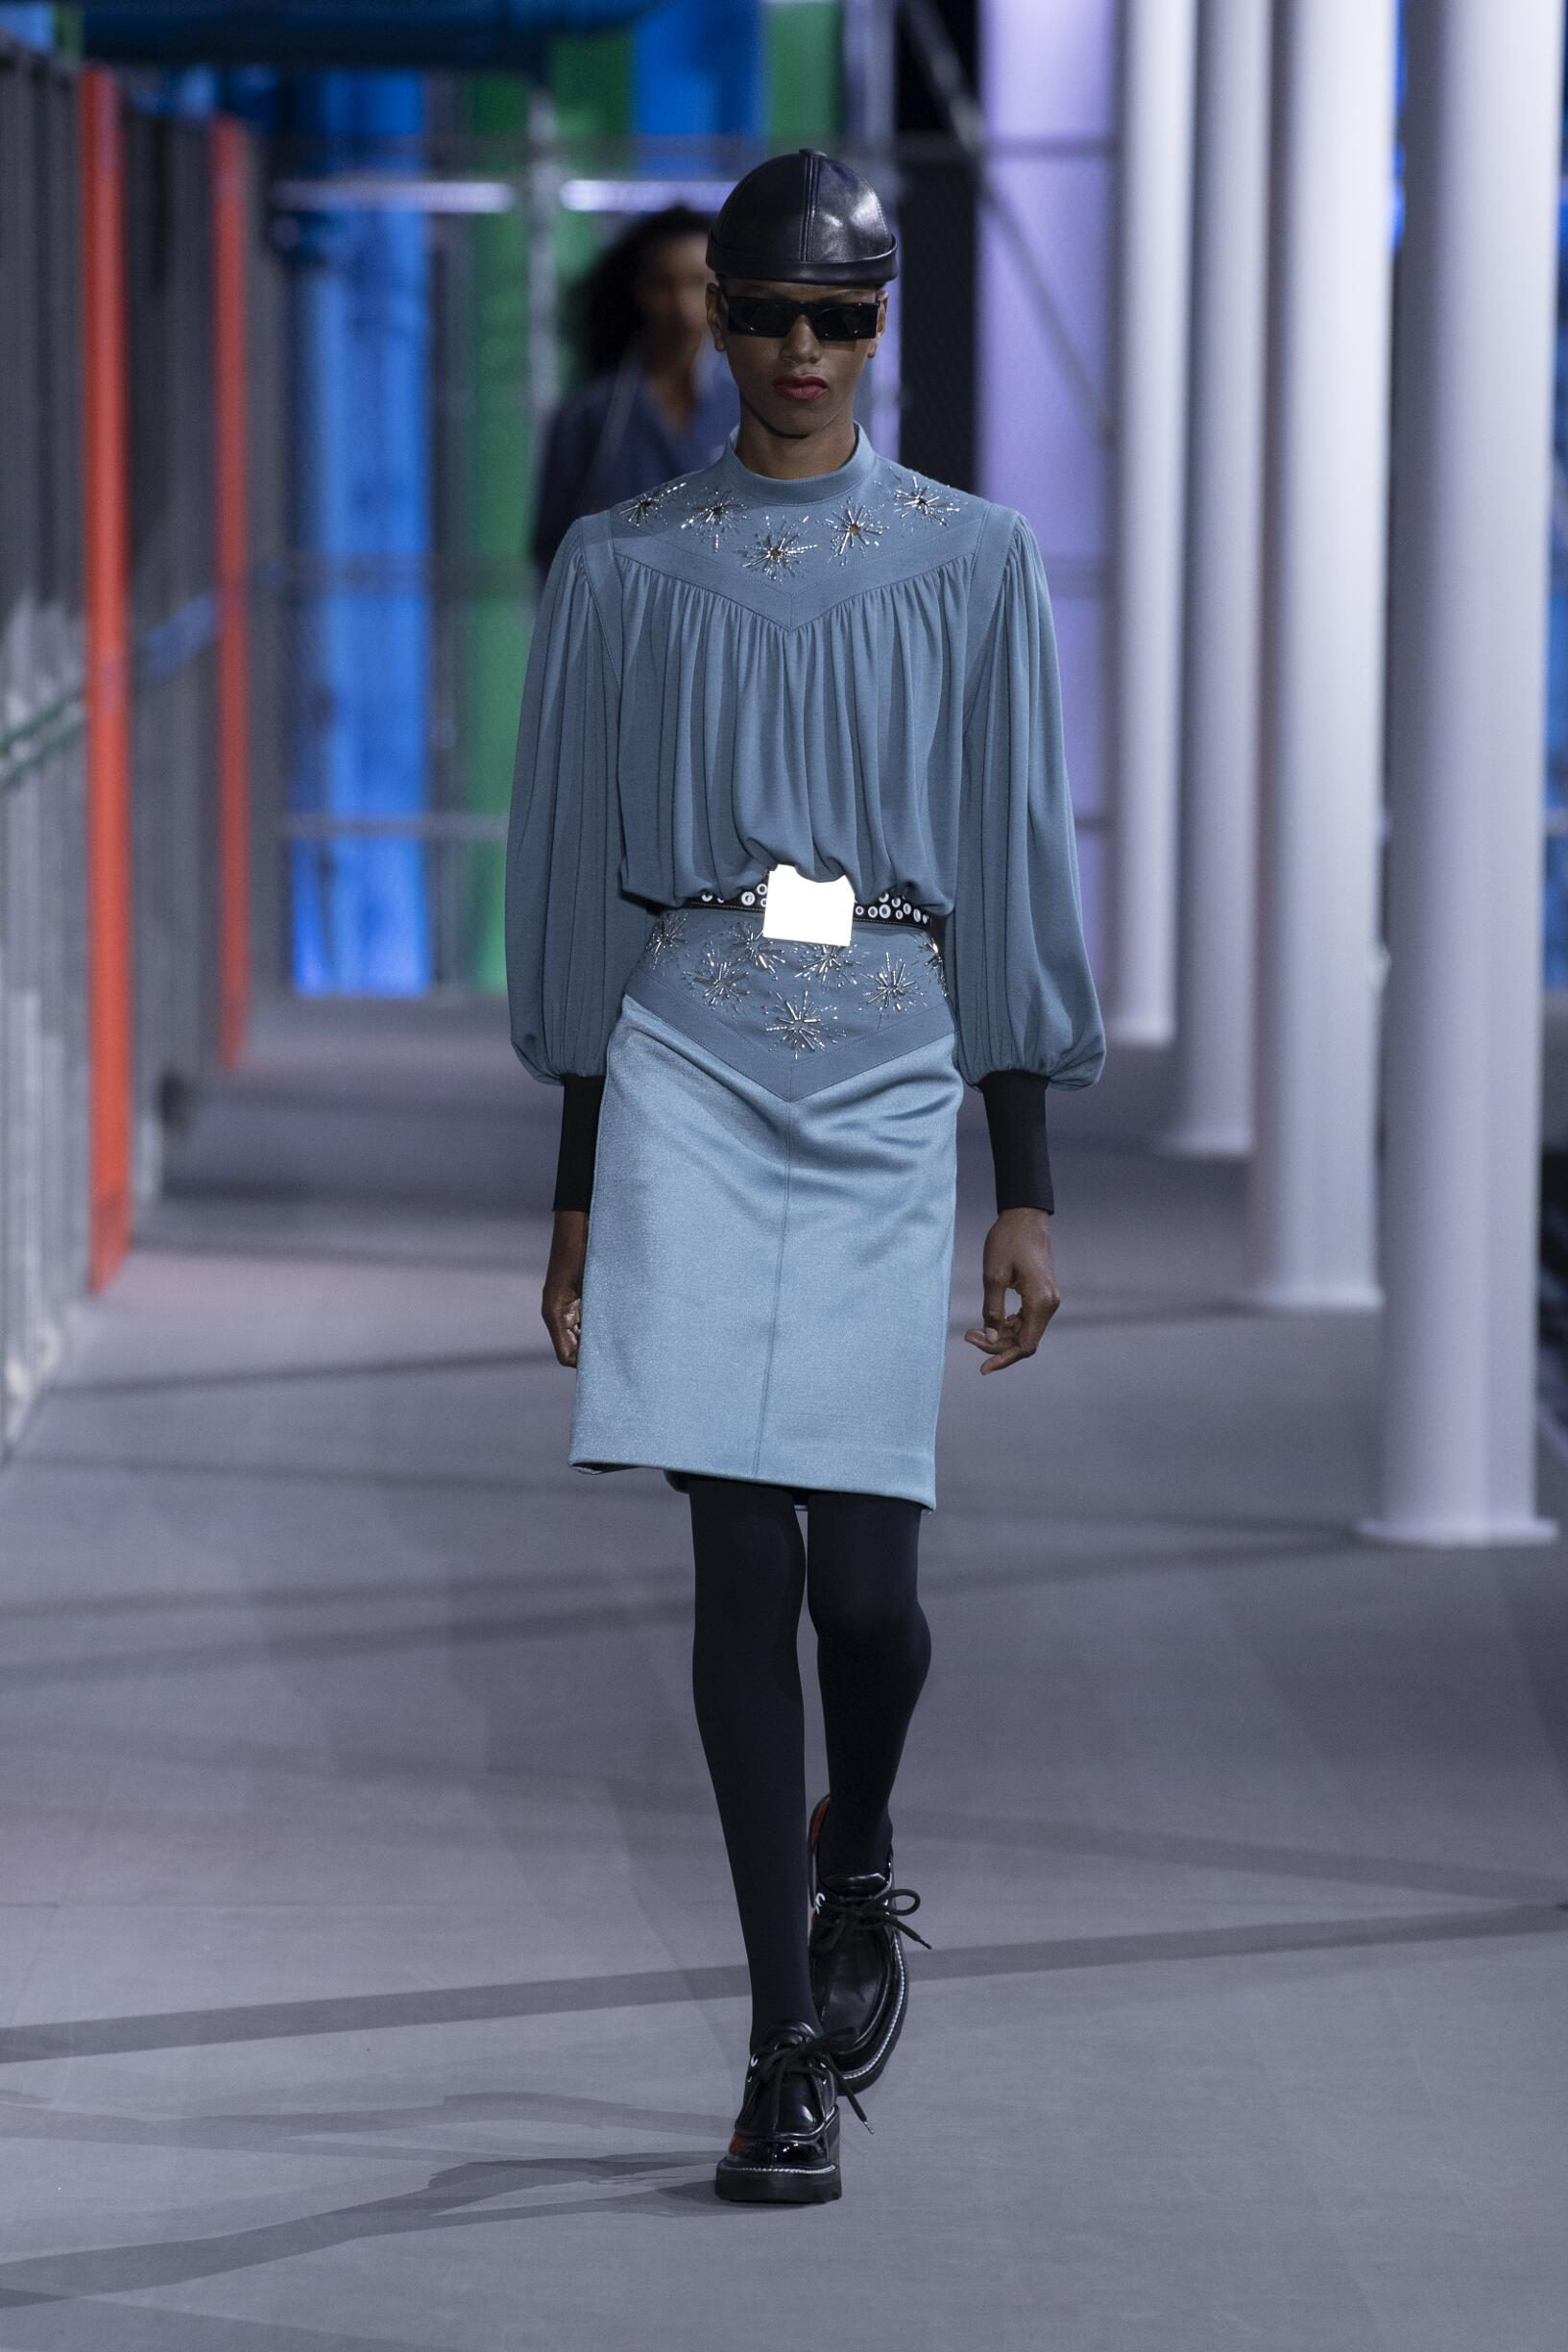 2019 Louis Vuitton Fall Winter Woman